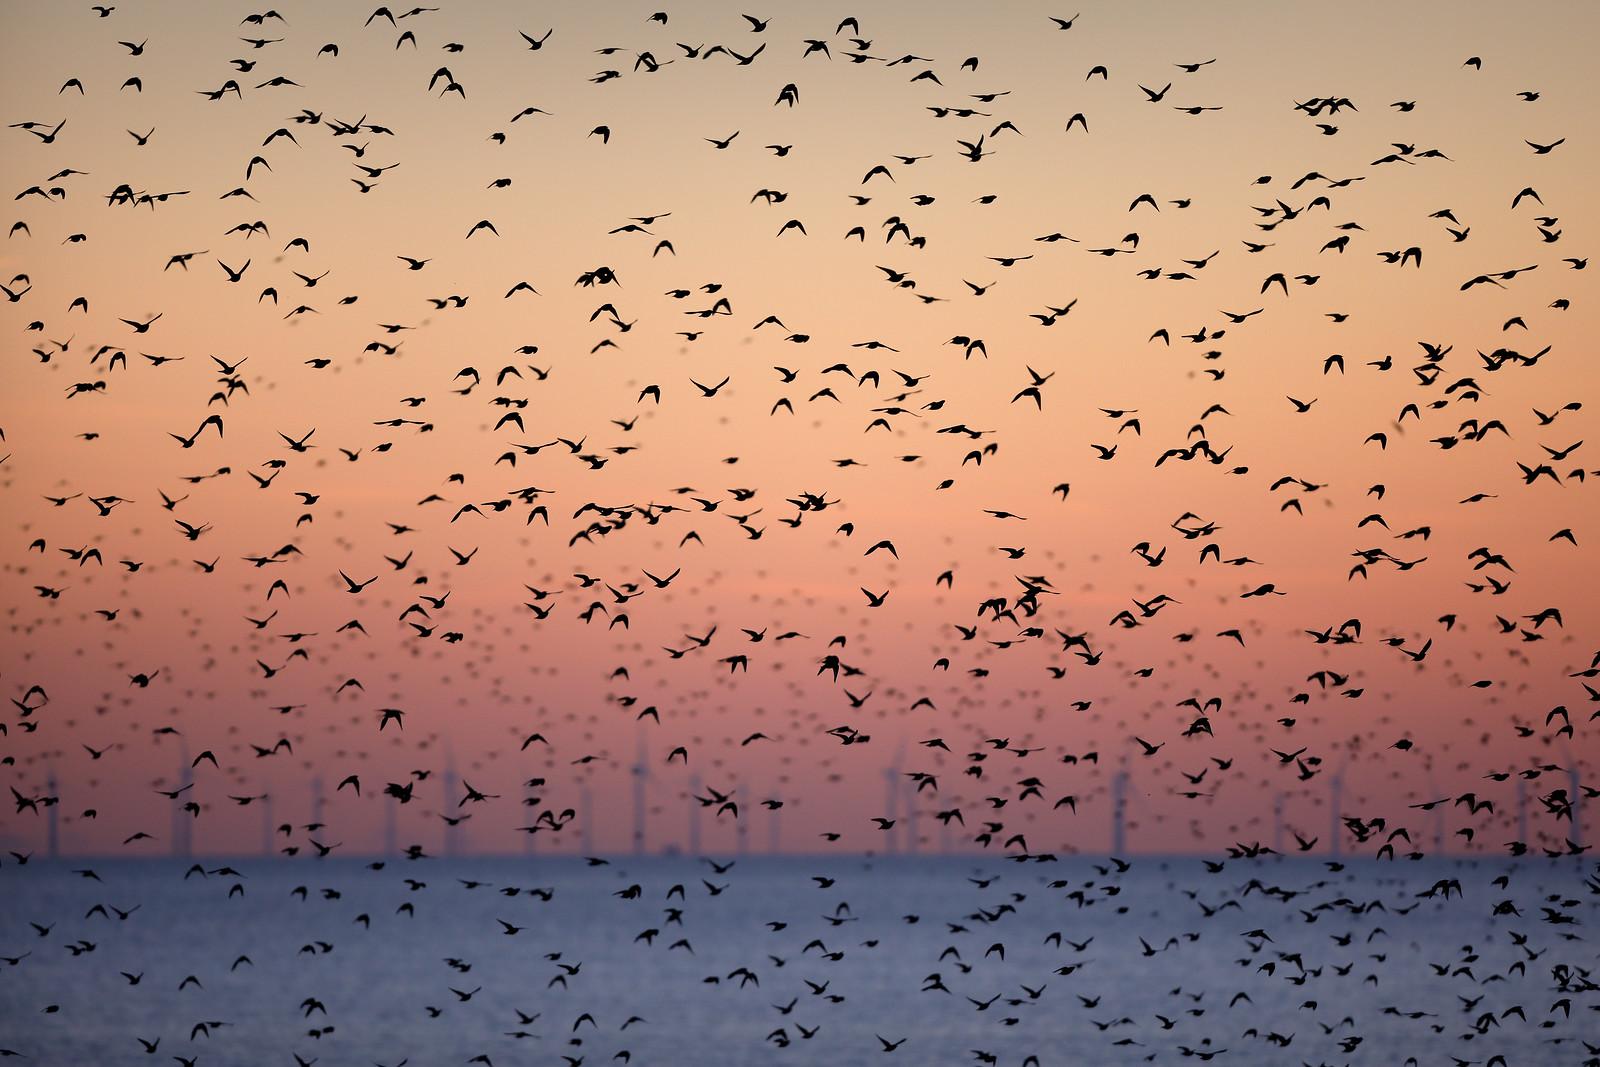 Starling Murmuration and Rampion Wind Farm